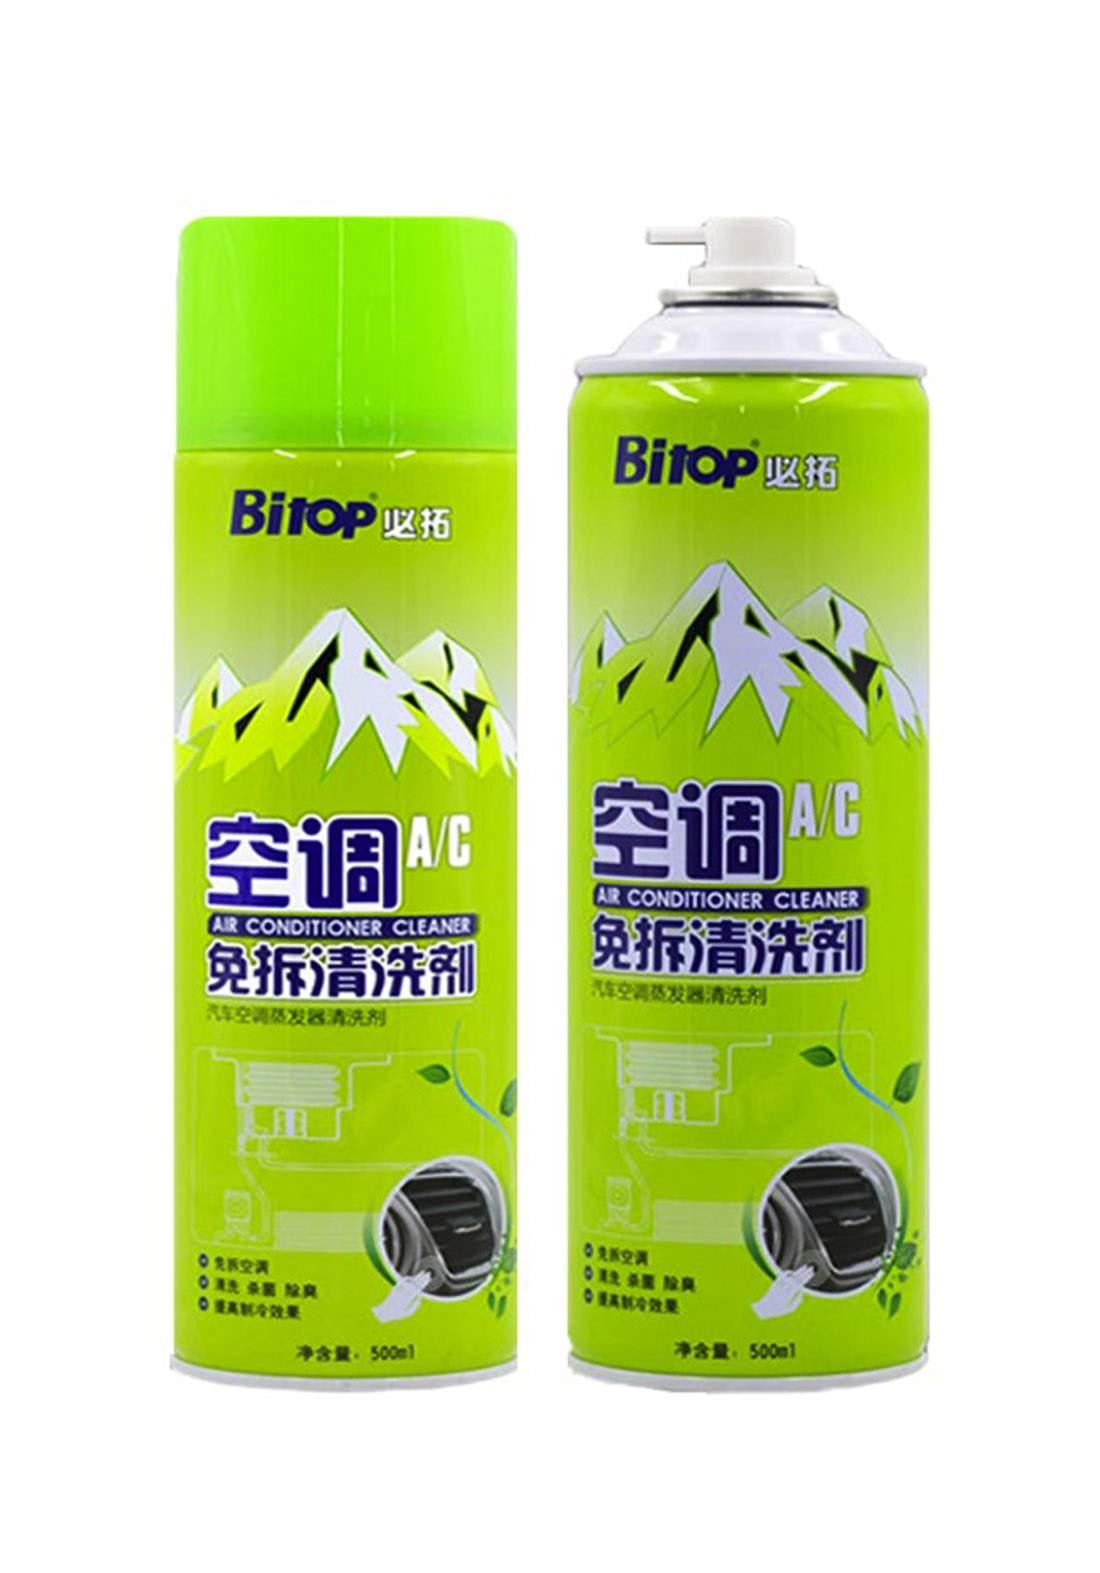 Bitop Car Air Conditioner Cleaning Element 500 ml  منظف ومعطر ومطهر لدكتات التبريد